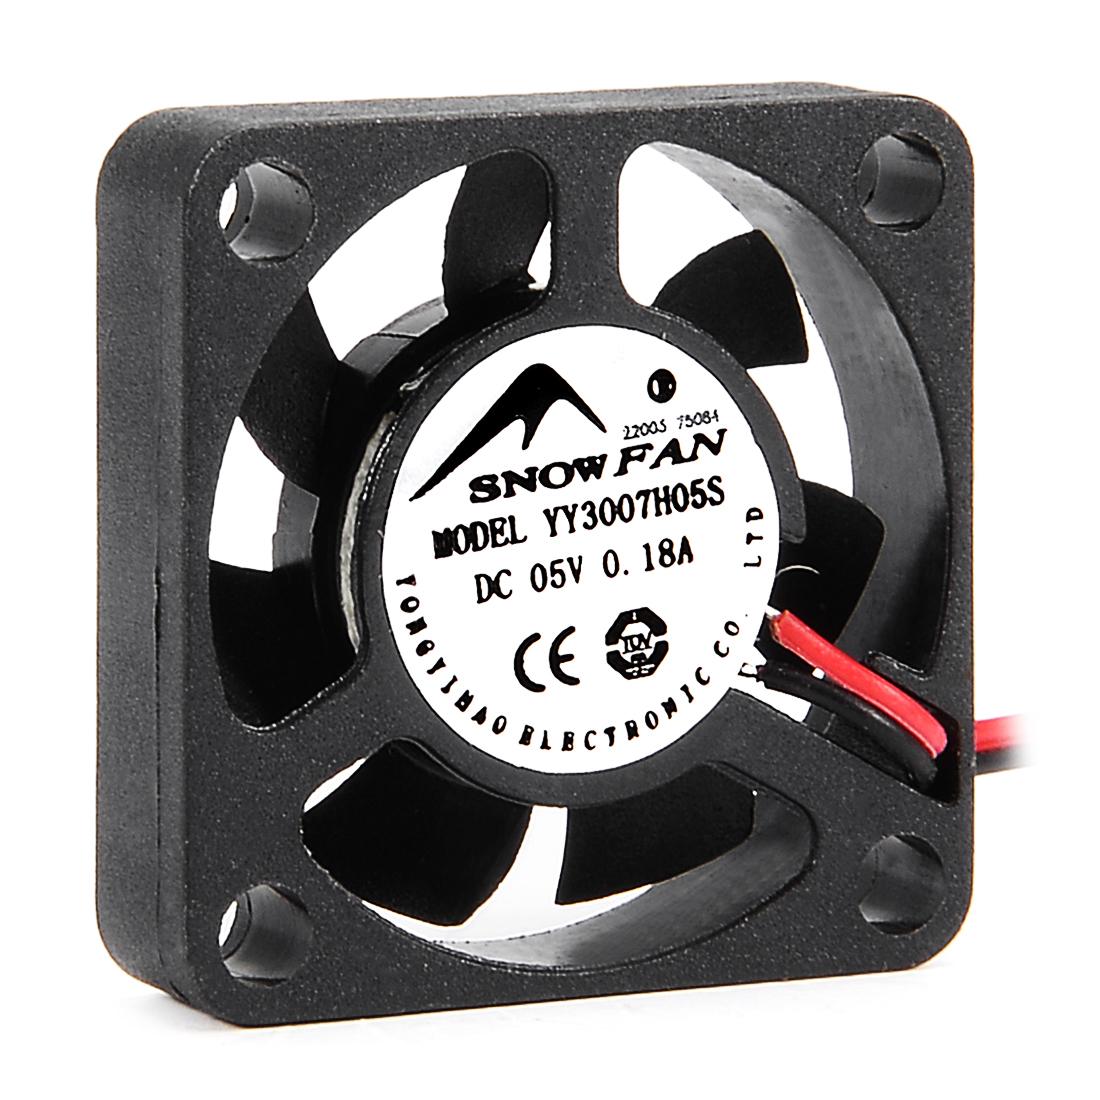 30mm x 30mm x 7mm 5V DC Cooling Fan Long Life Sleeve Bearing Computer Case Fan